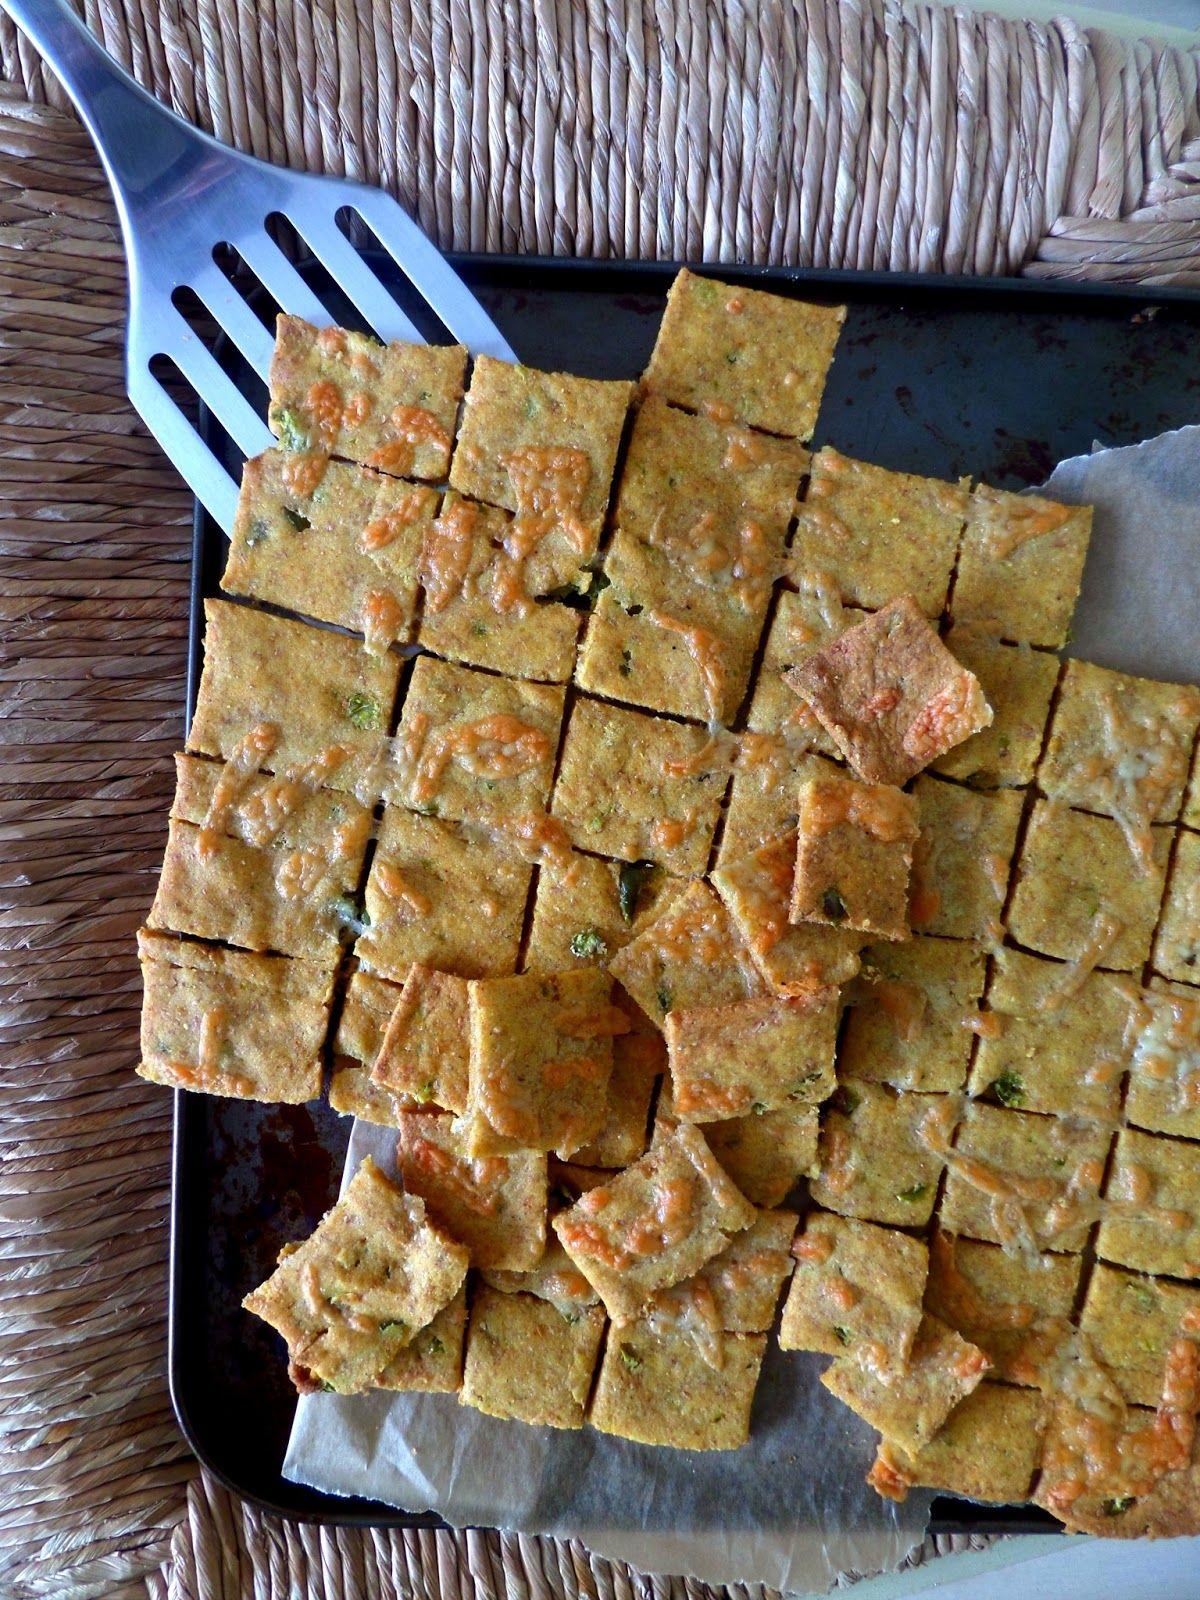 Jalapeno cheddar polenta crackers // Crackers a la polenta, piment jalapeno et cheddar | My Nomad Cuisine